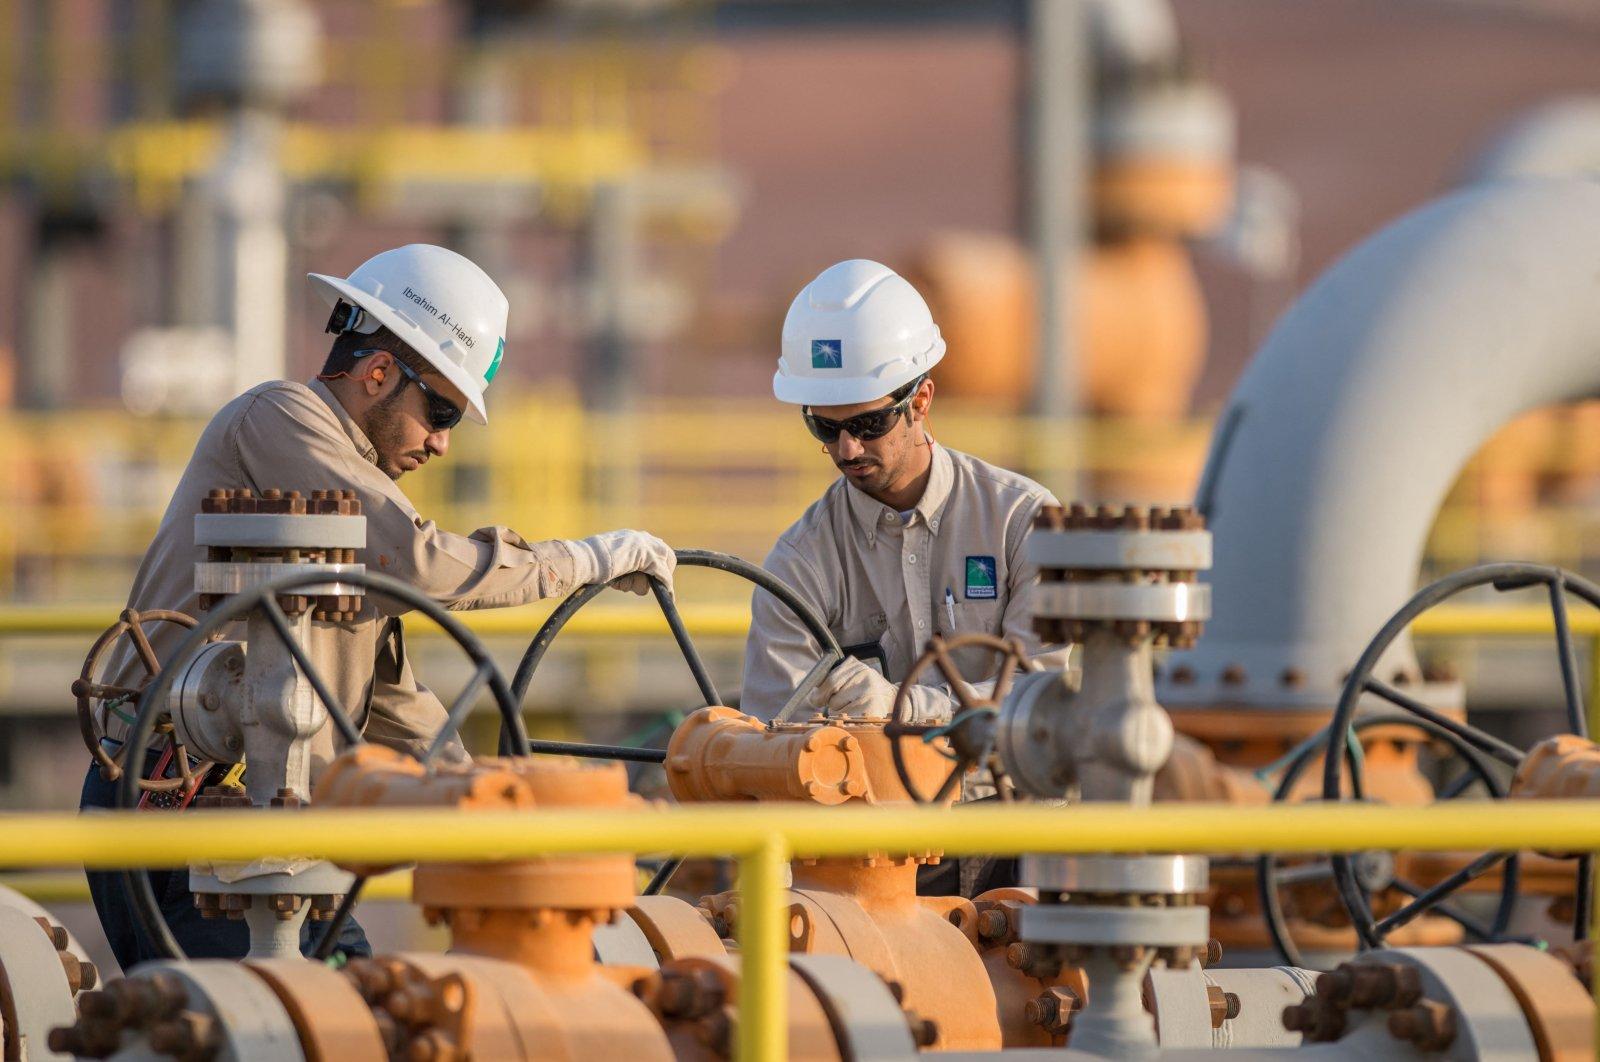 Engineers work at a Saudi Aramco facility, Saudi Arabia, Dec. 19, 2016. (Saudi Aramco via AFP)